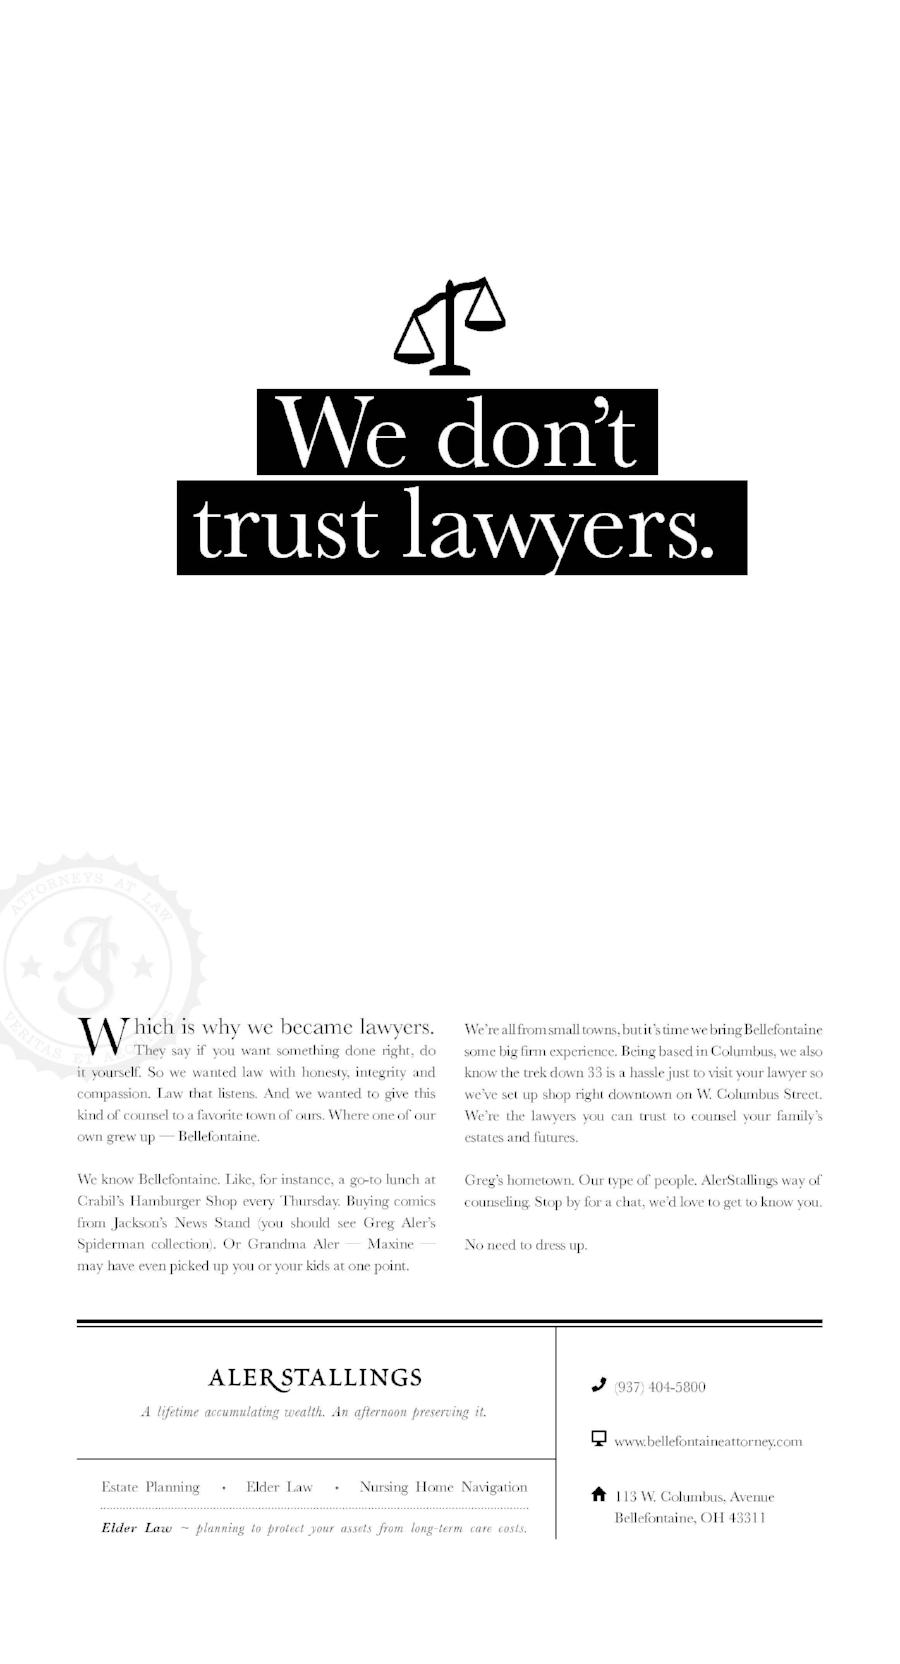 We don't trust lawyers.jpg